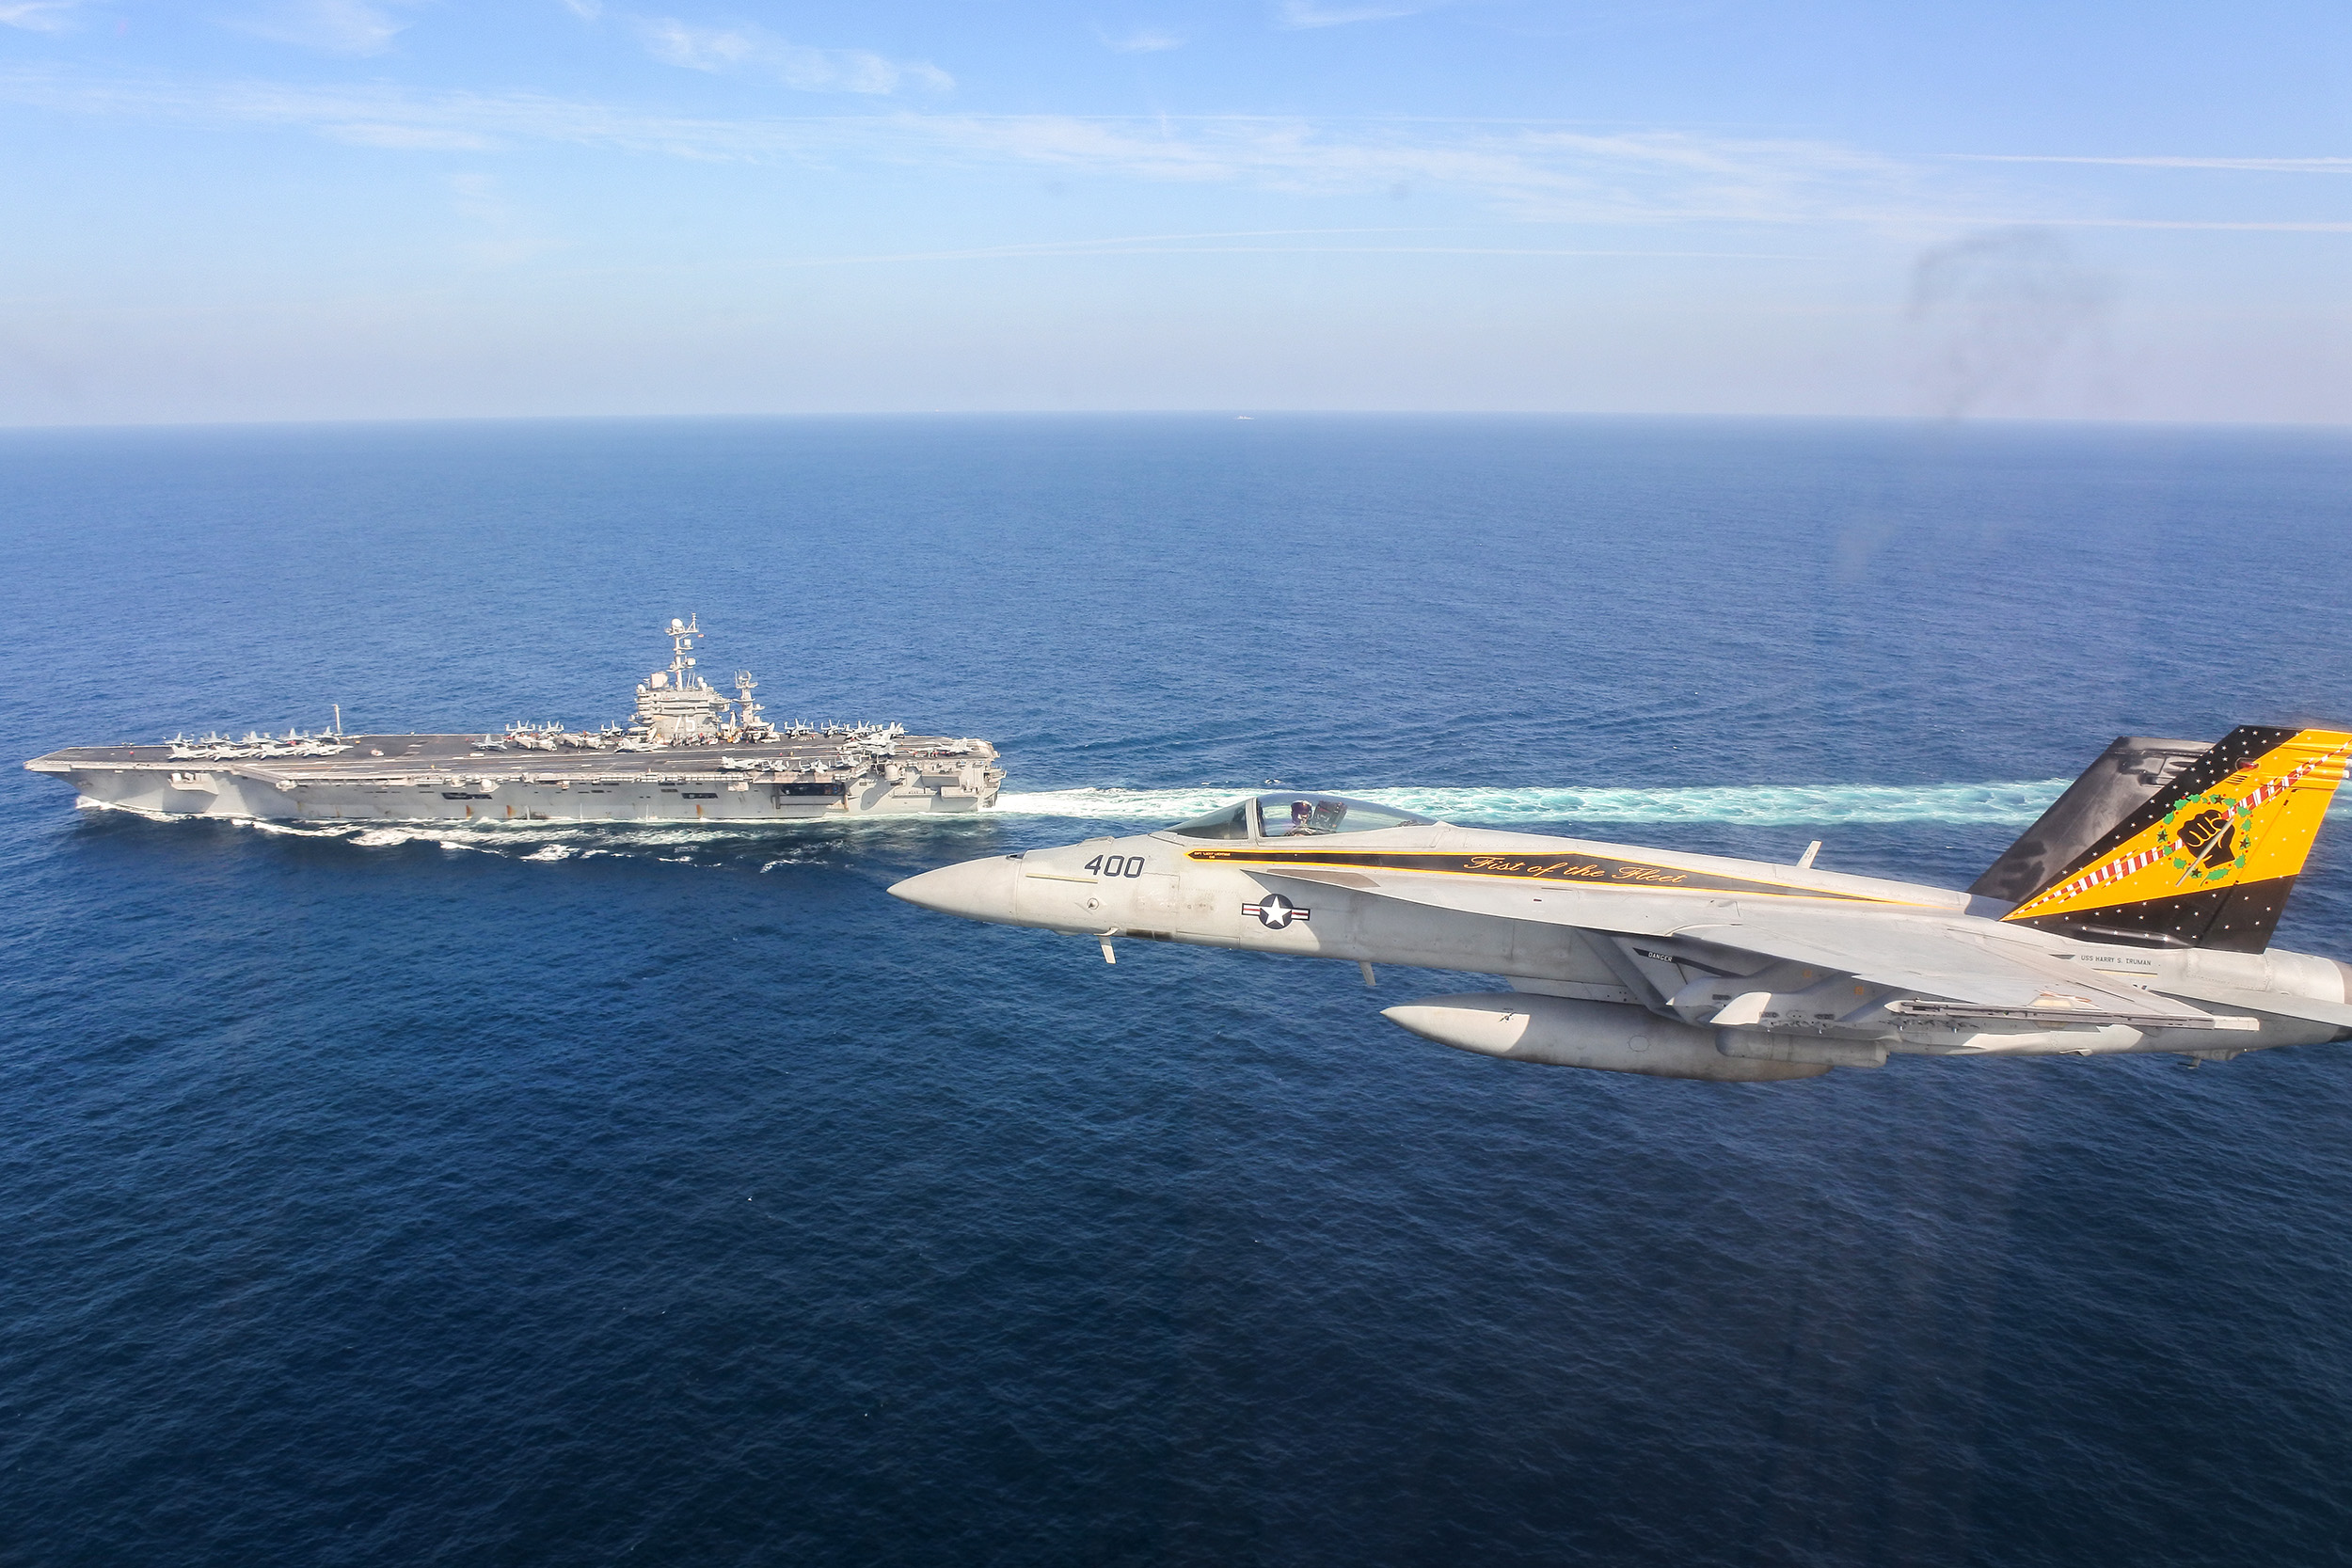 A F/A-18E Super Hornet over the Gulf of Oman near the aircraft carrier USS Harry S. Truman (CVN-75). US Navy Photo